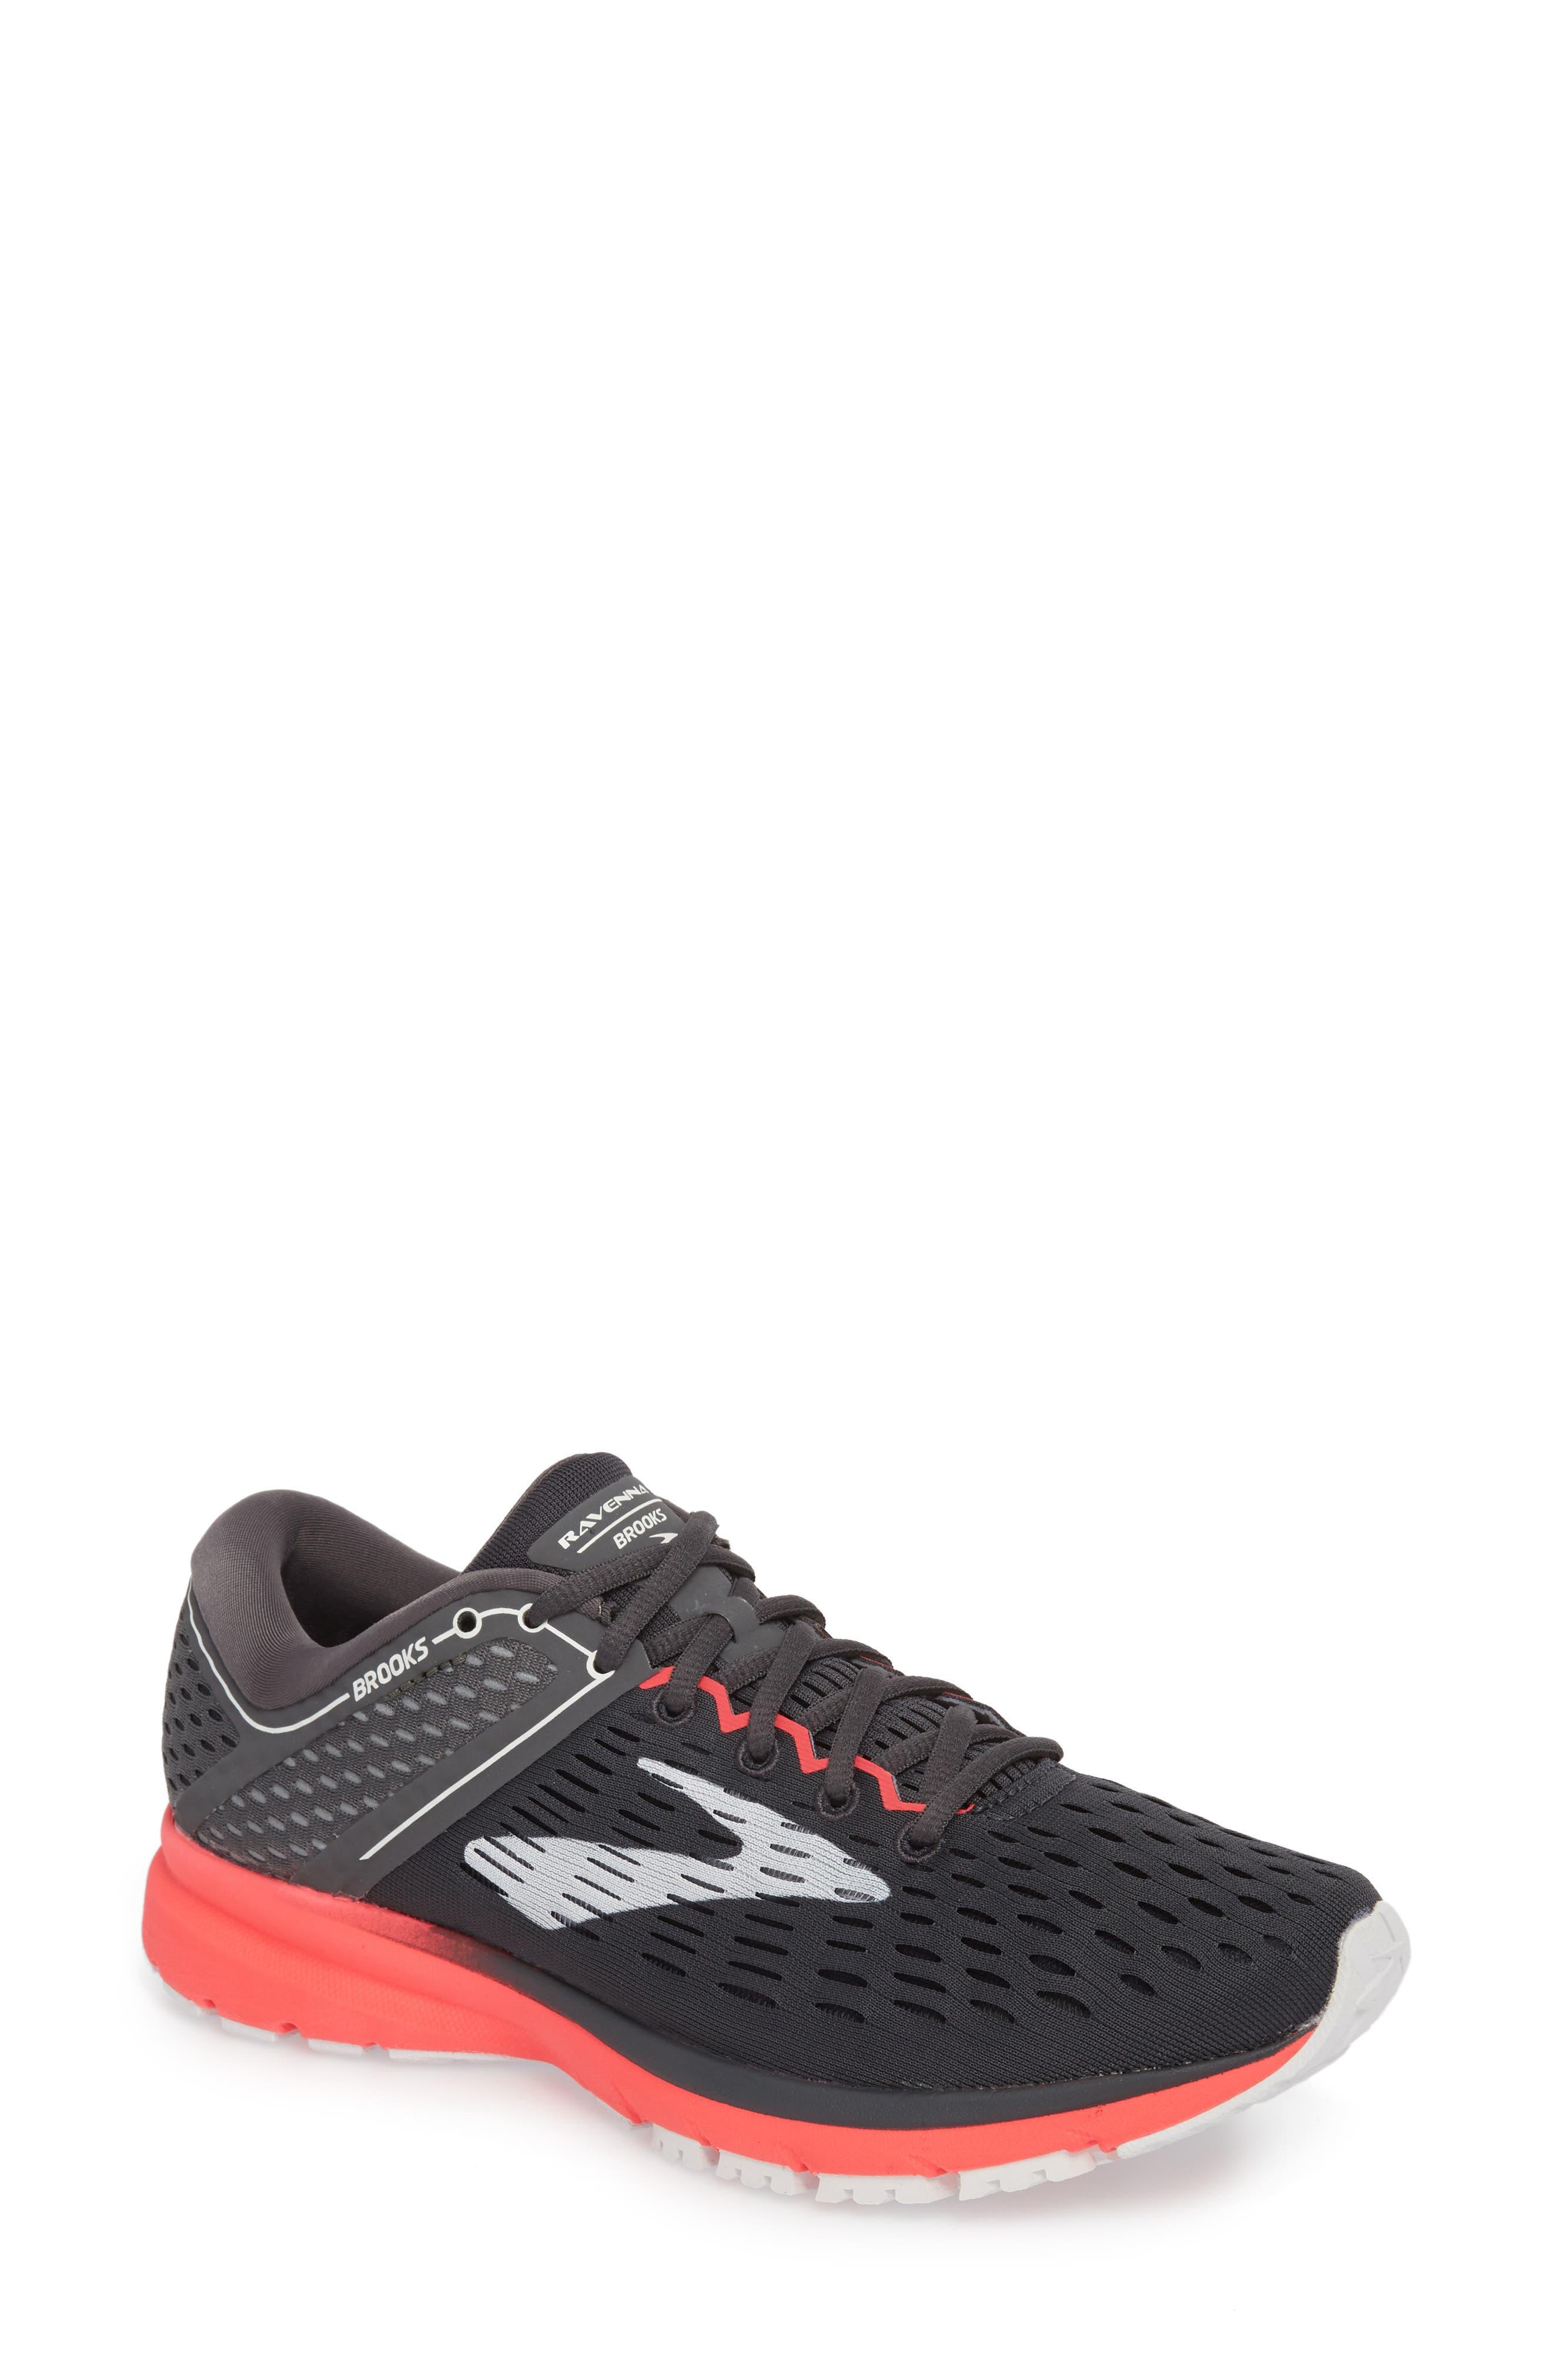 Ravenna 9 Running Shoe,                         Main,                         color, EBONY/ DIVA PINK/ WHITE